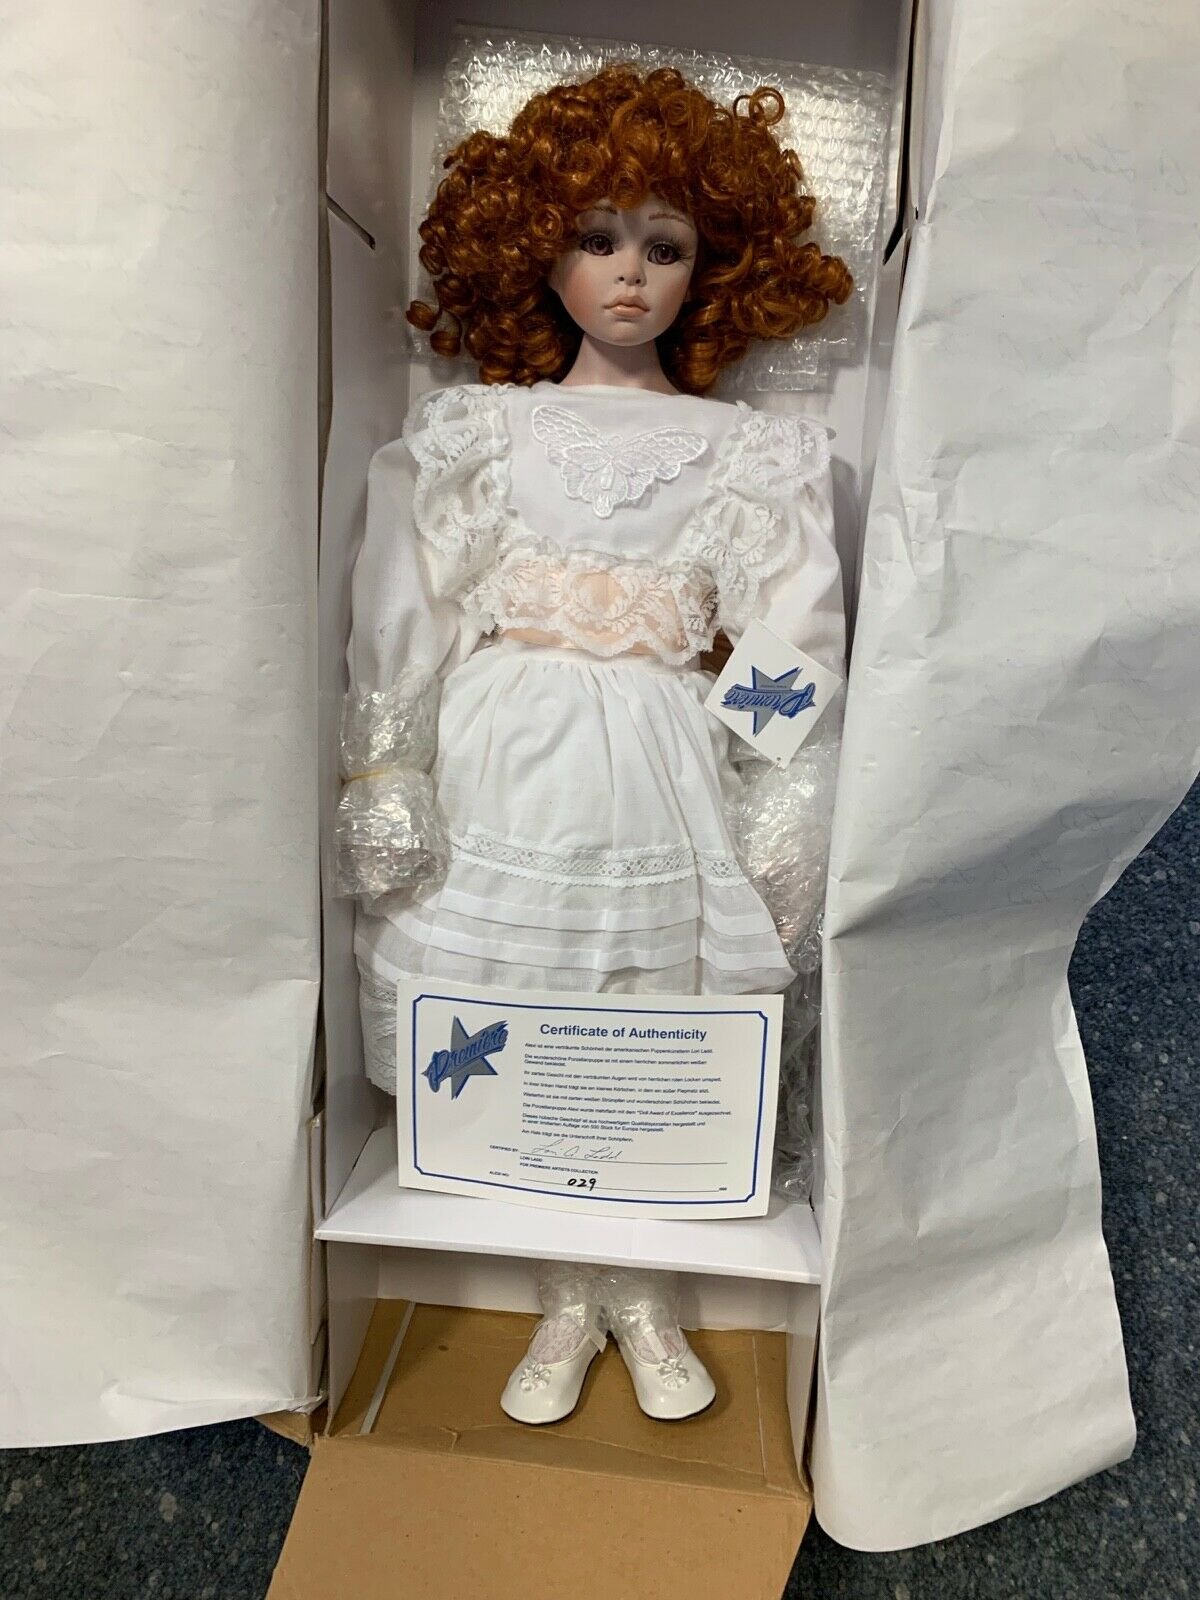 Bambola D'Autore Porcellana 73 Cm. Conf. Orig. & Zertifikat. Ottime Condizioni